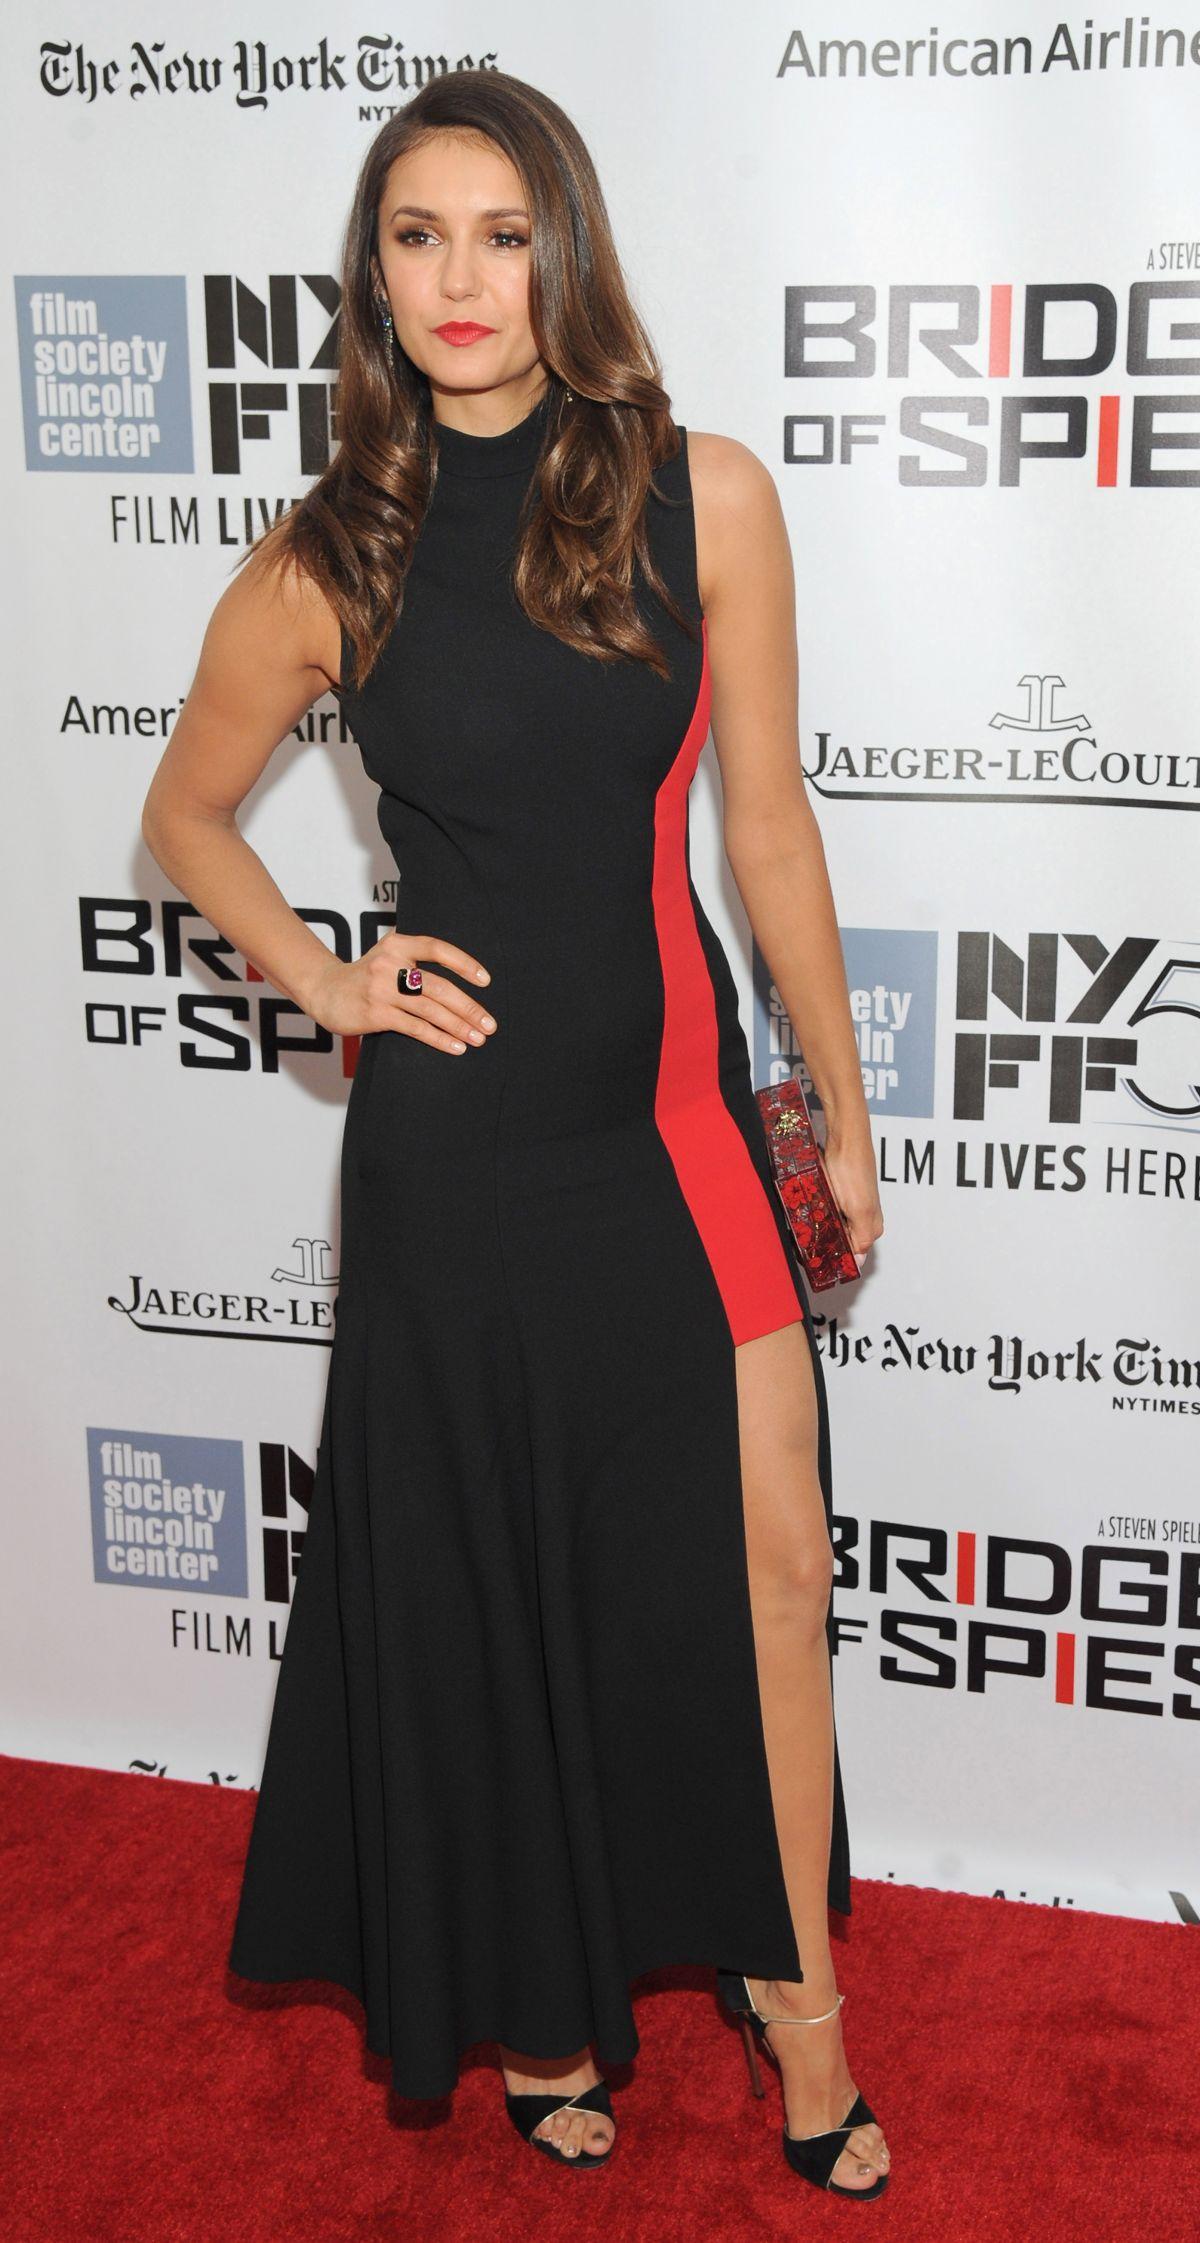 nina dobrev at bridge of spies premiere at the 53rd new york film festival 10 04 2015 hawtcelebs. Black Bedroom Furniture Sets. Home Design Ideas